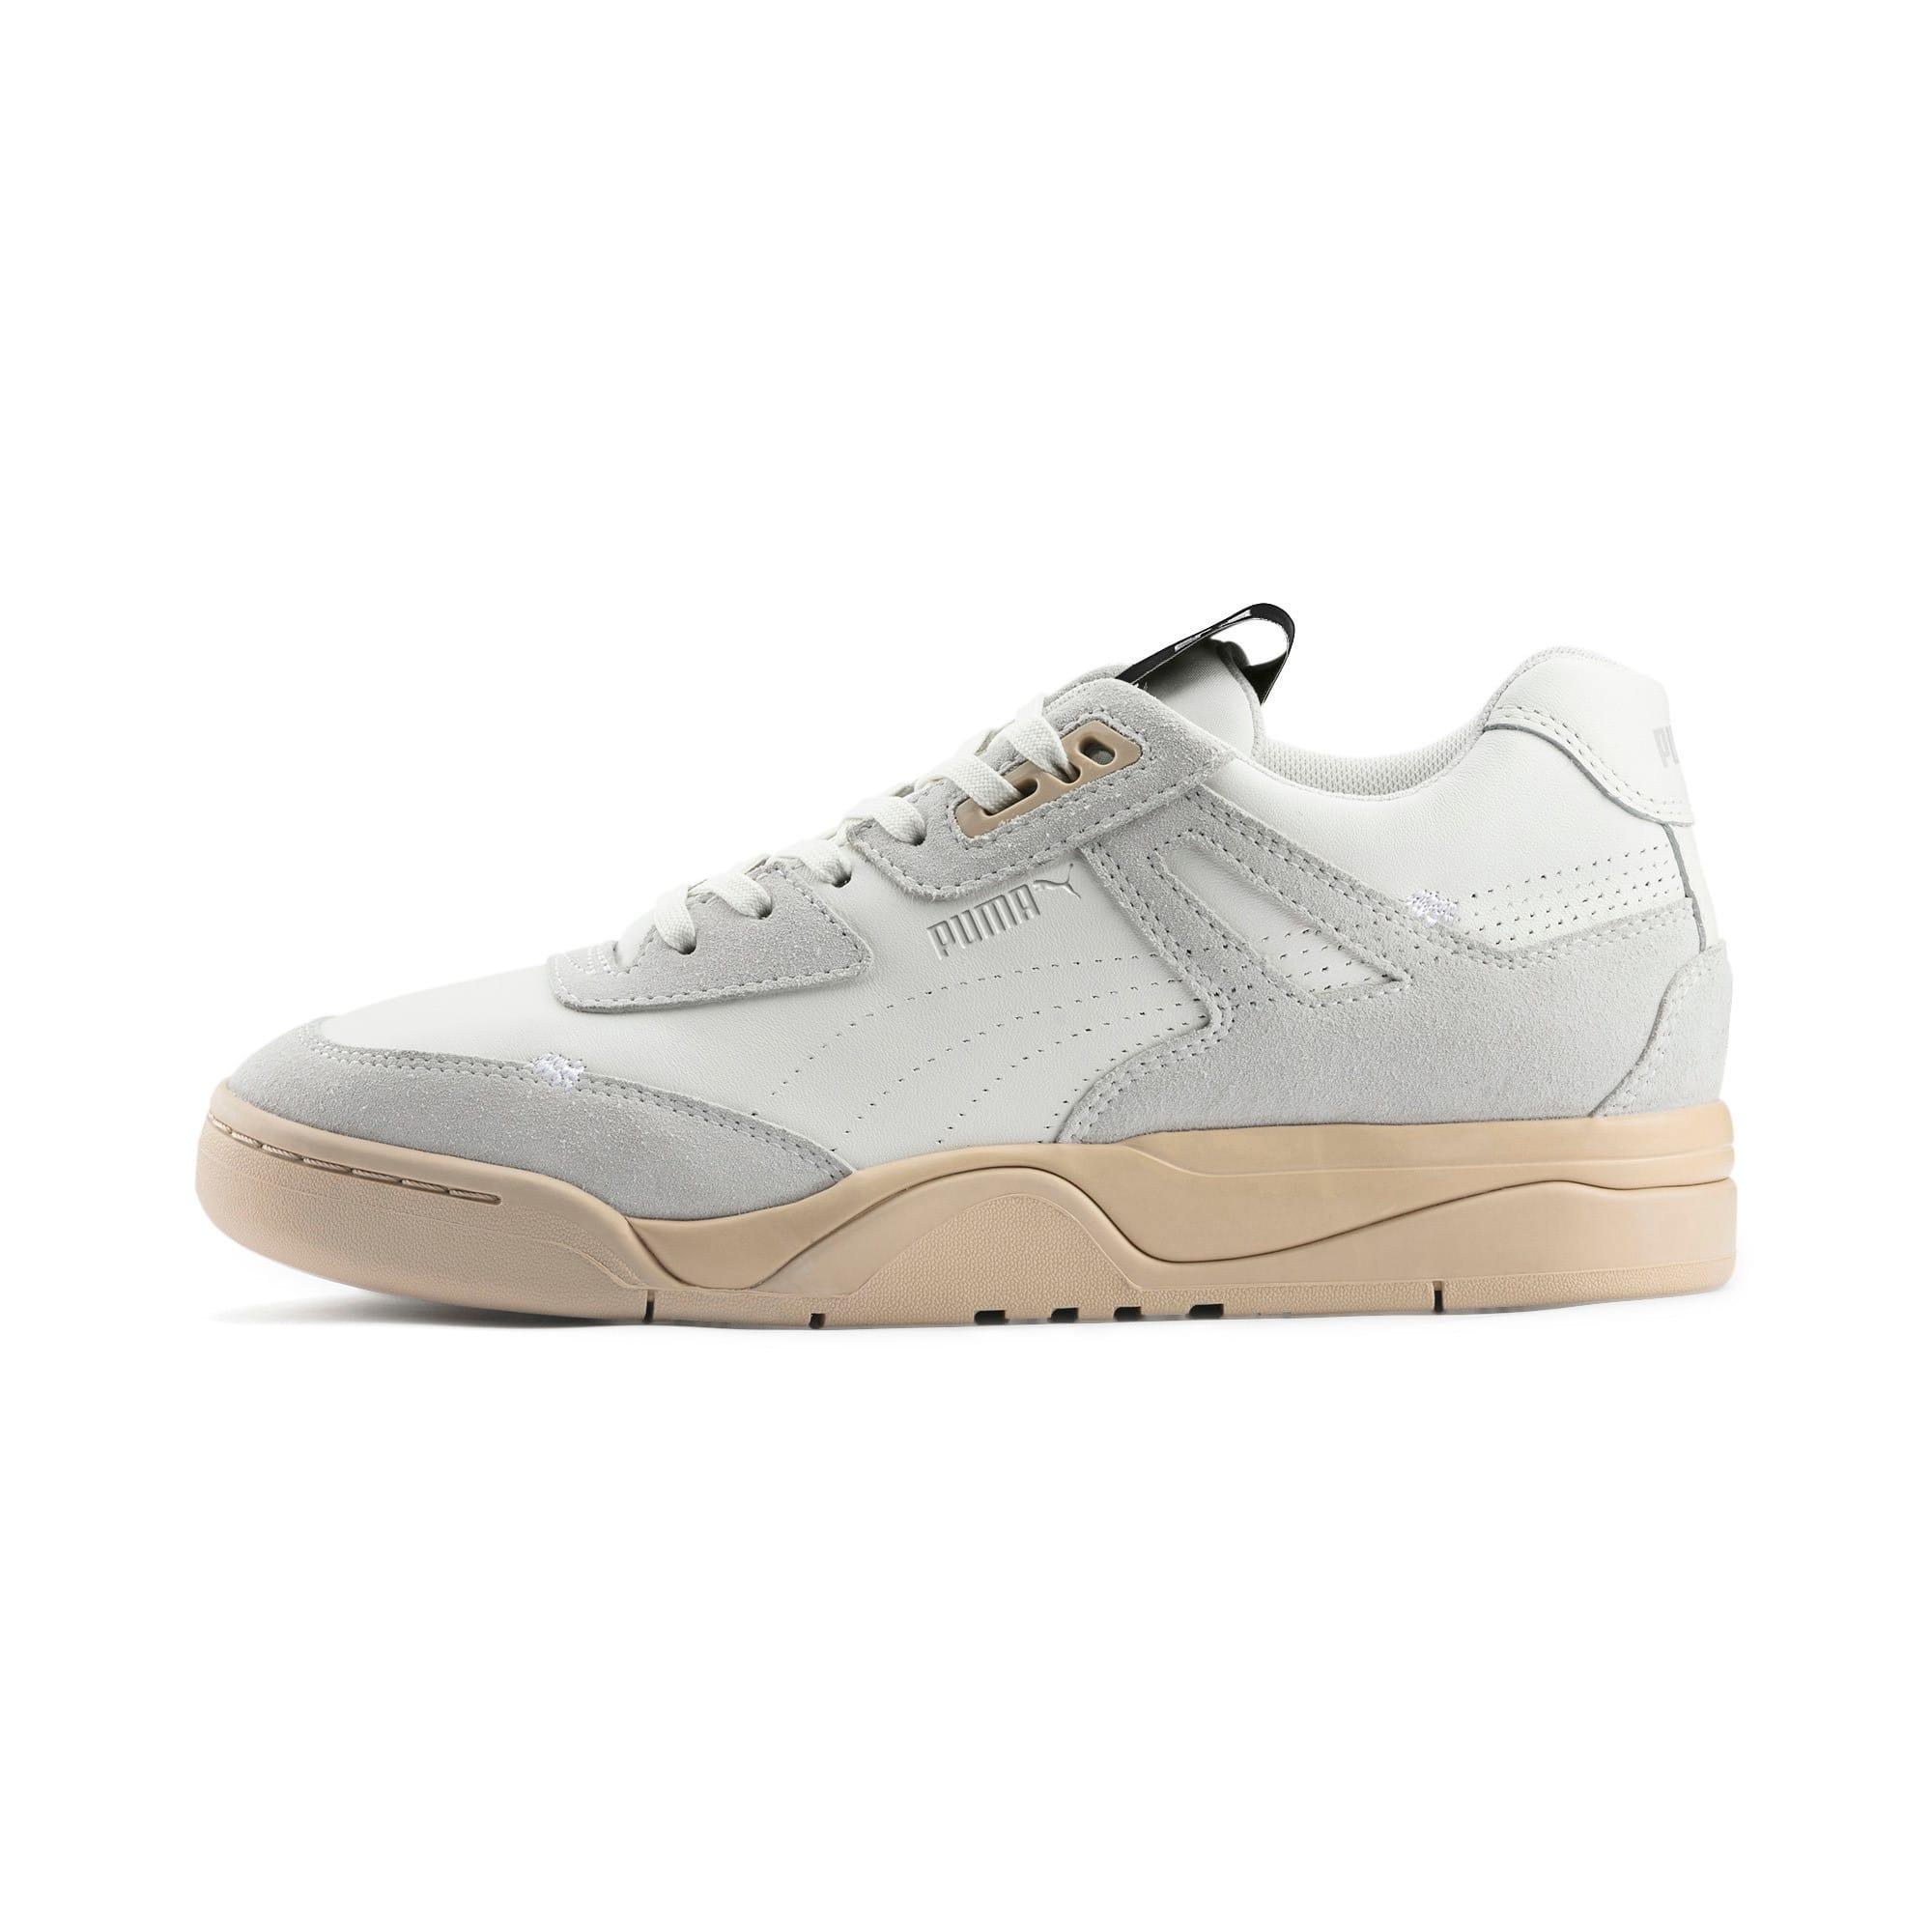 Thumbnail 1 of PUMA x RHUDE Palace Guard Sneakers, Star White-WINDCHIME, medium